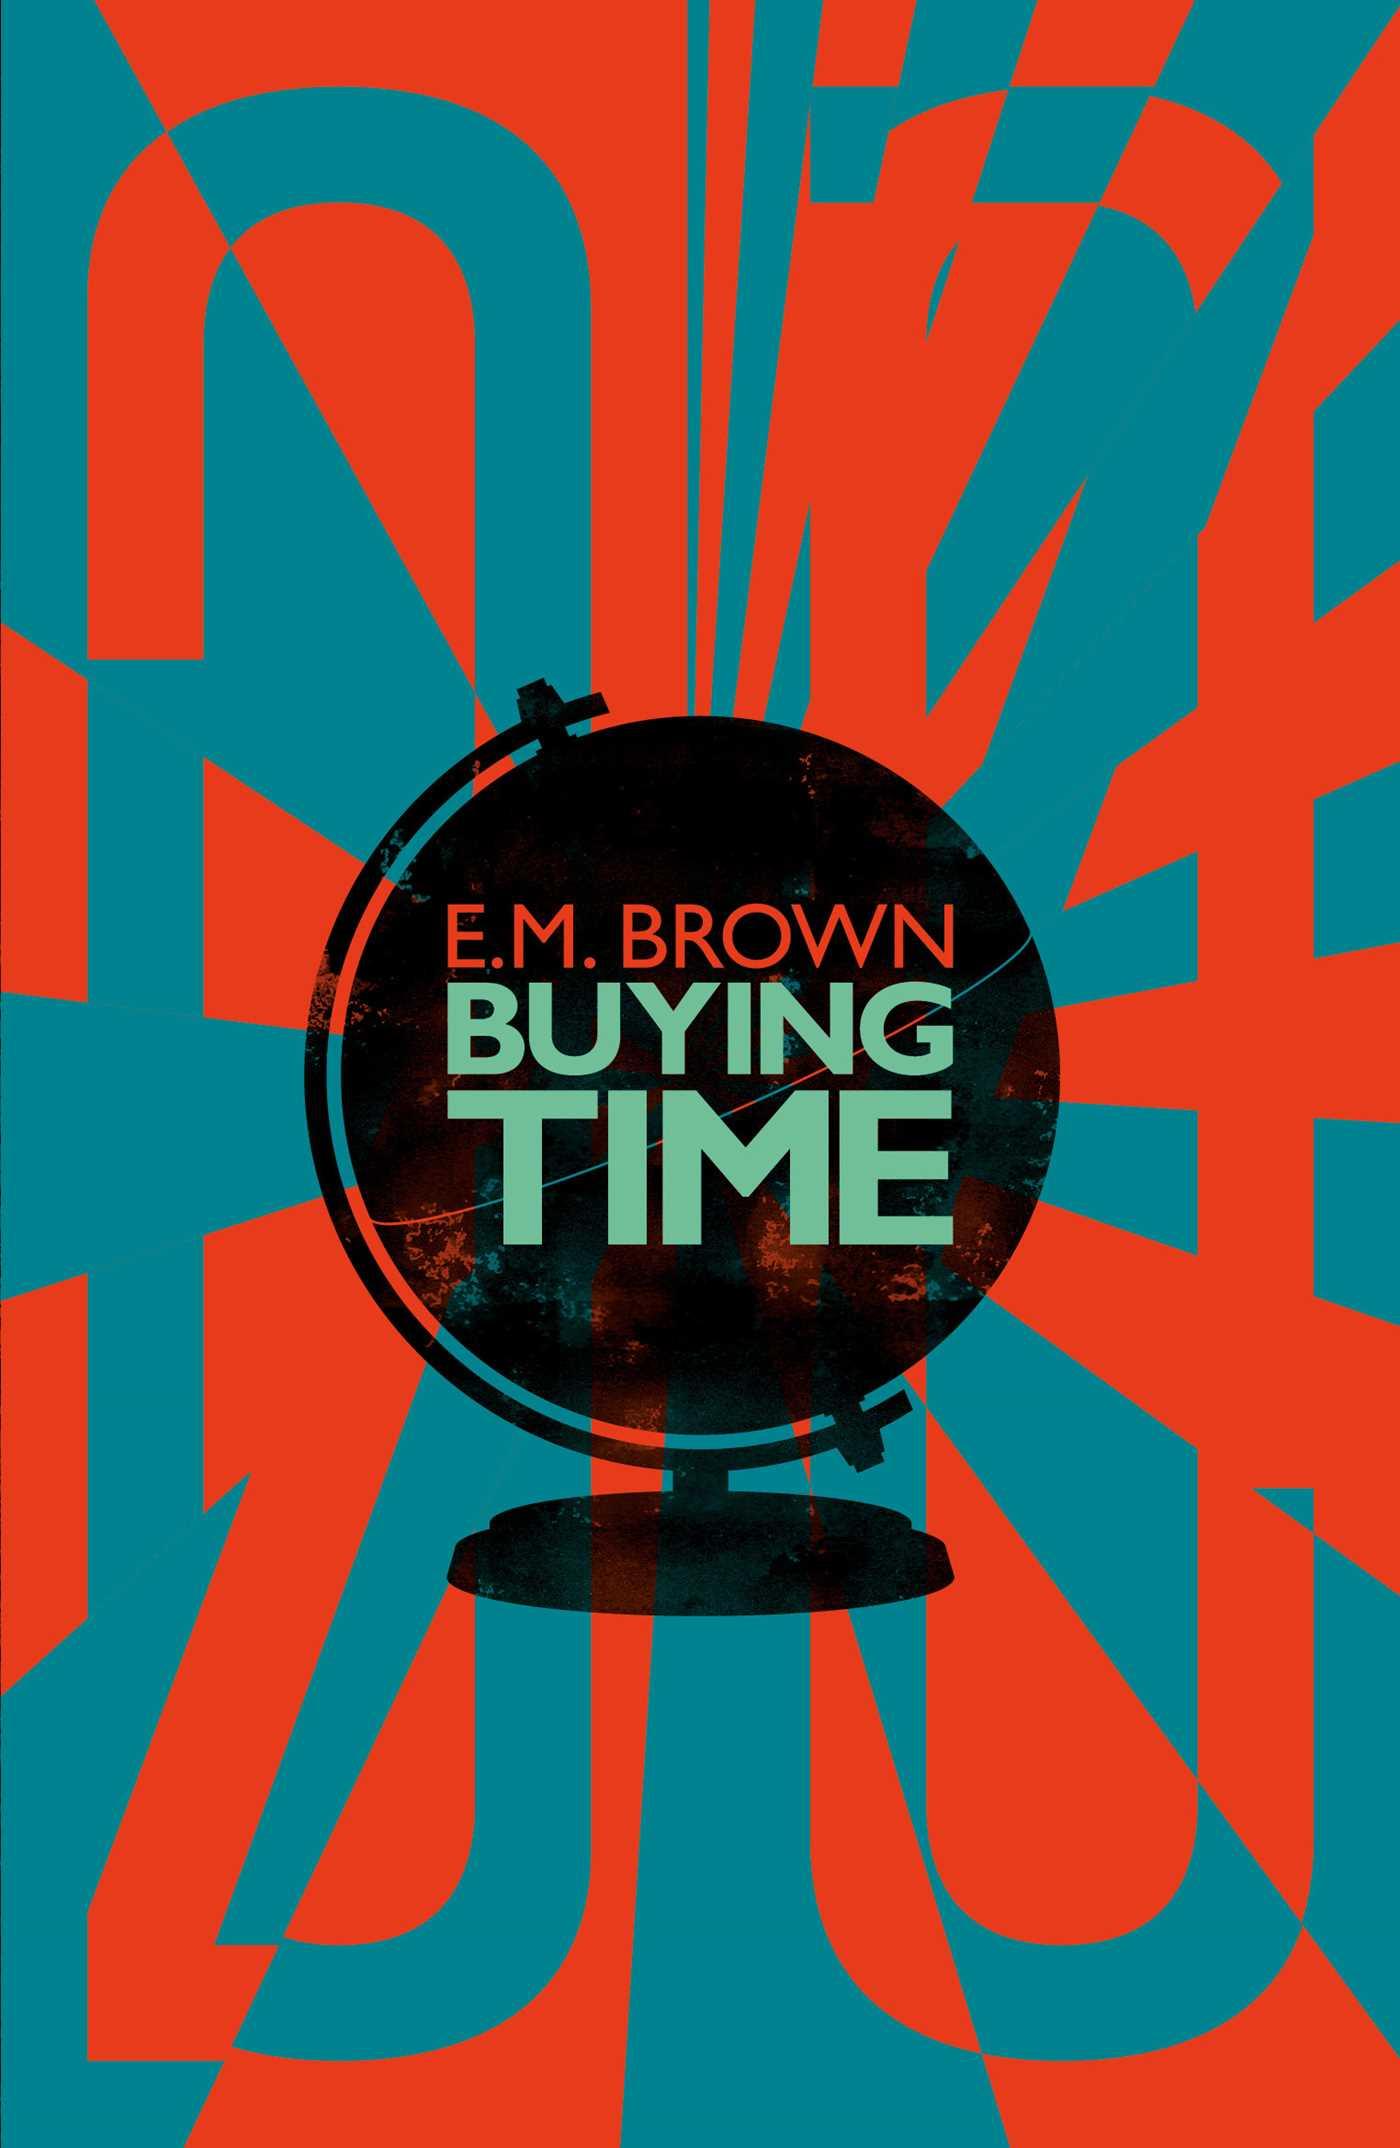 Buying time 9781781085080 hr